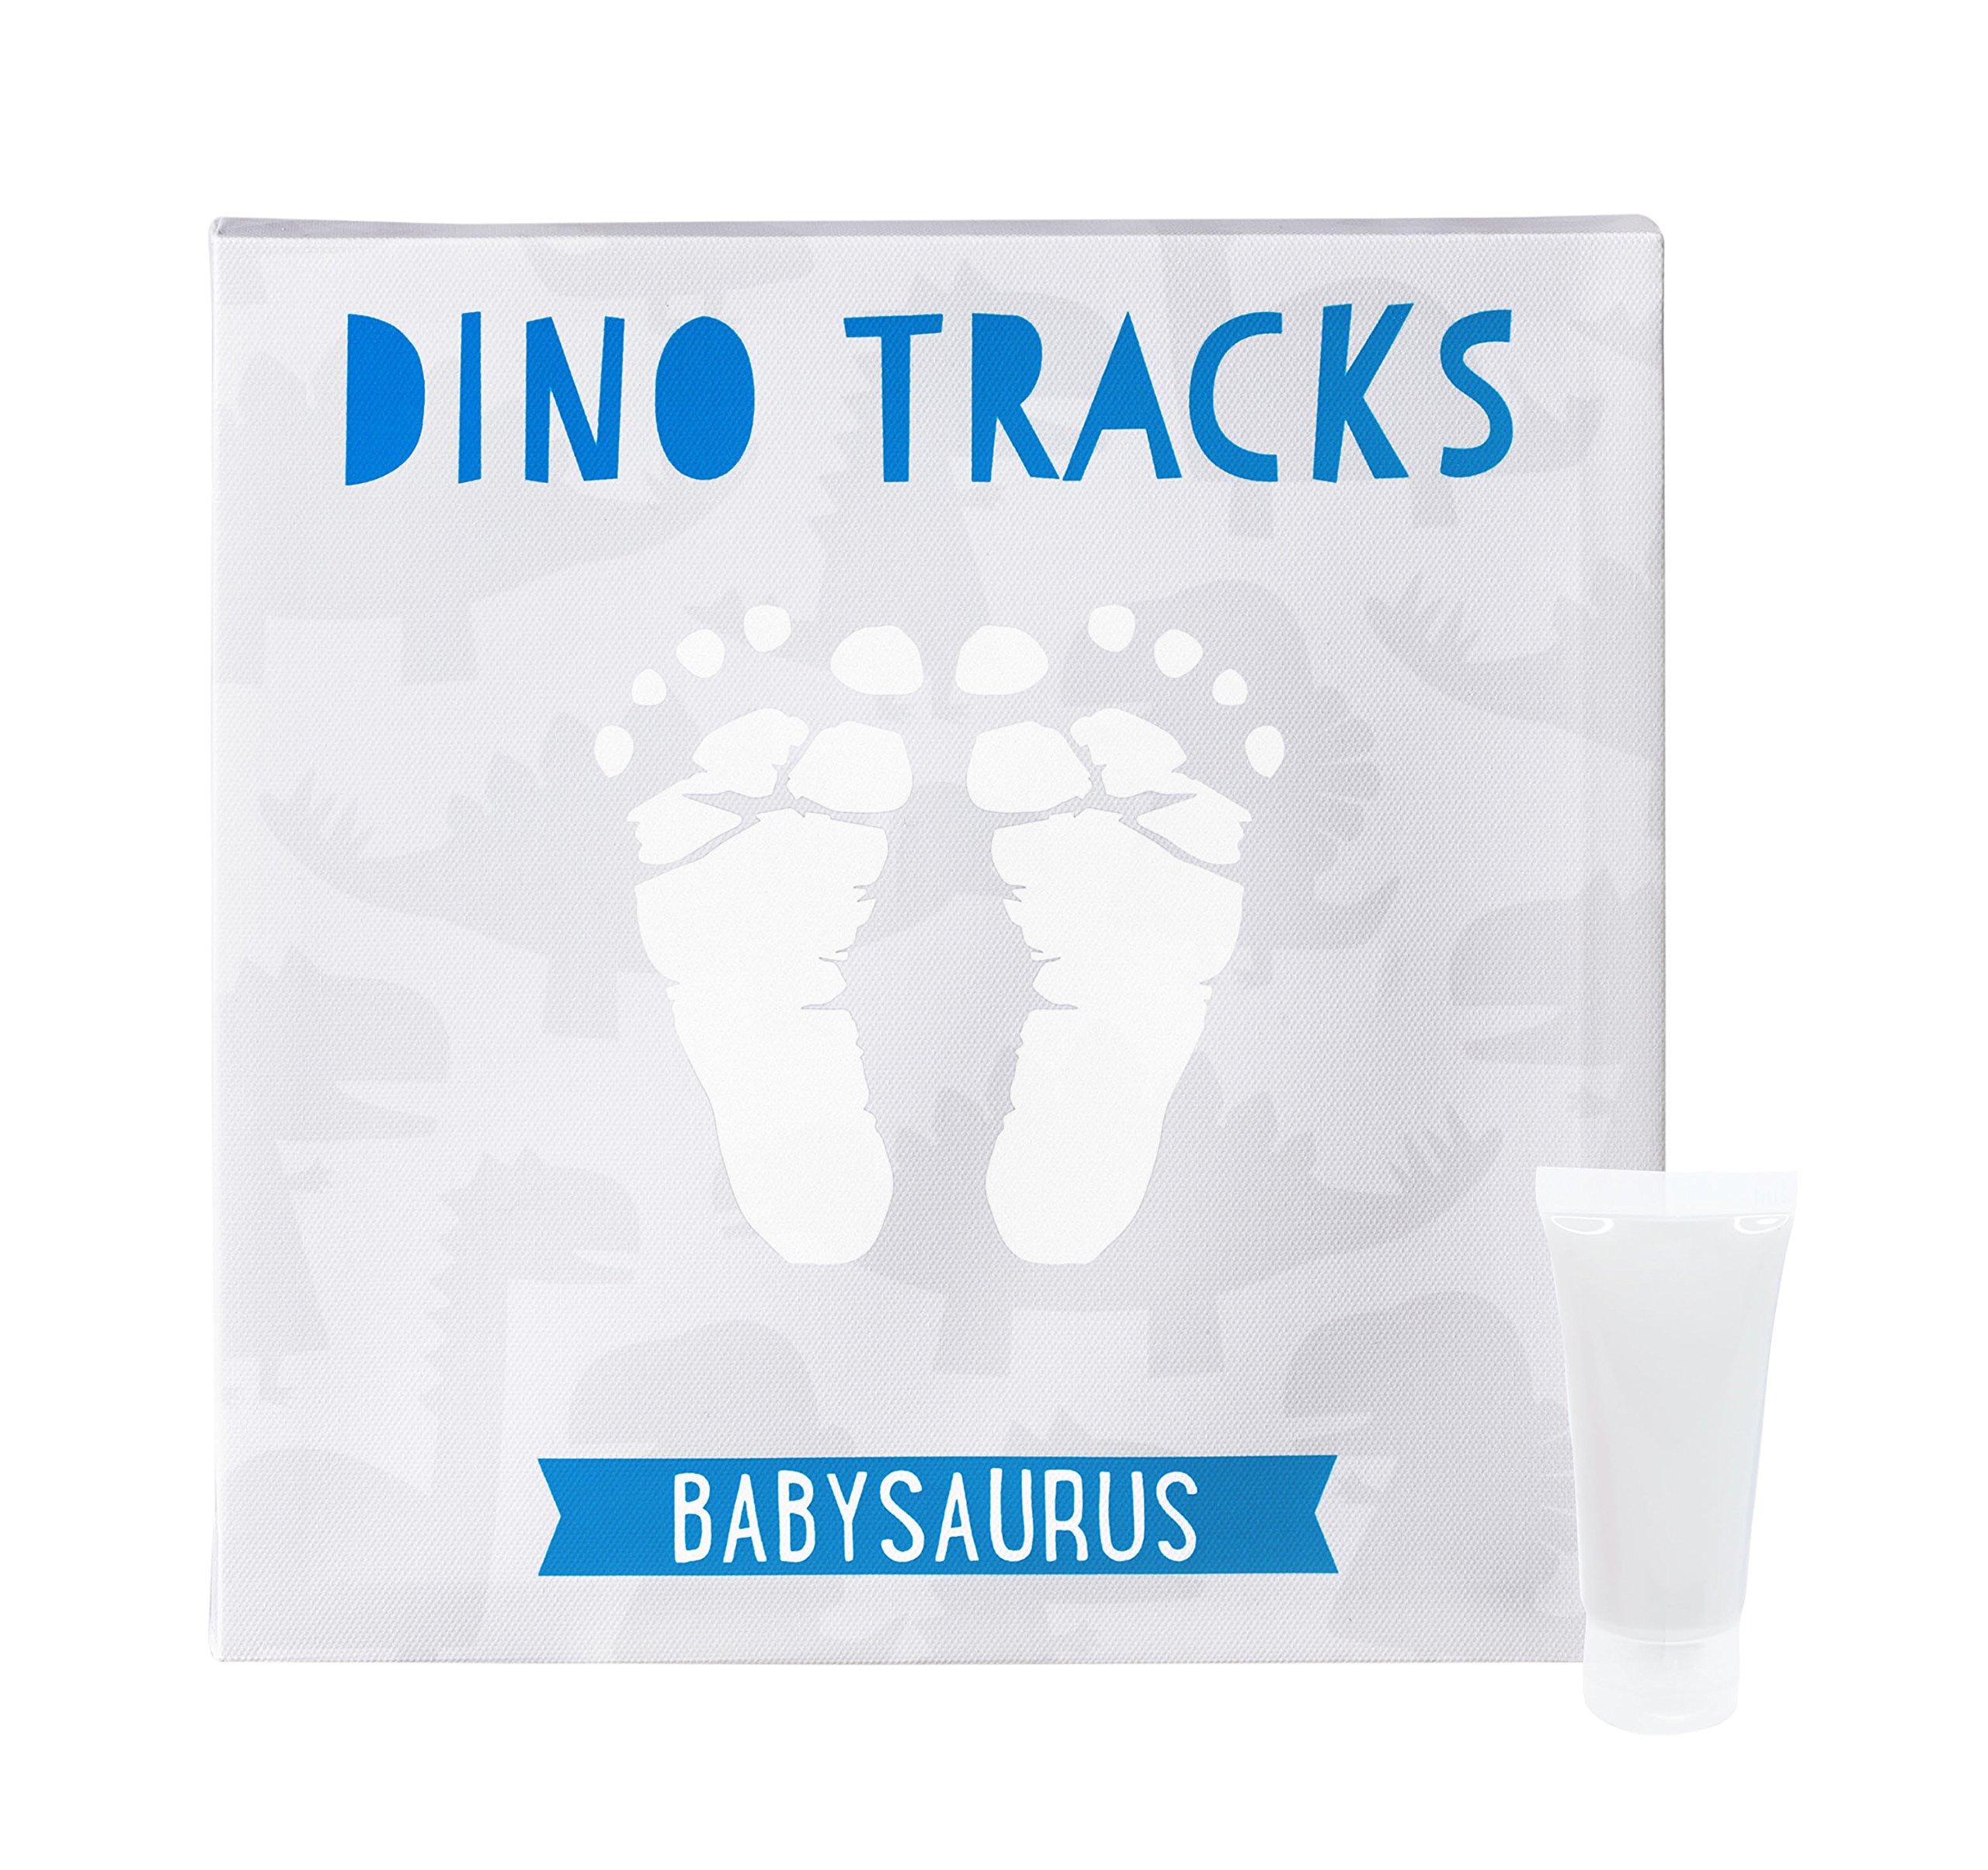 Pearhead Dino Tracks Babyprints Baby Handprint or Footprint Keepsake Wall Canvas and Paint Kit, Babysaurus Blue and Gray